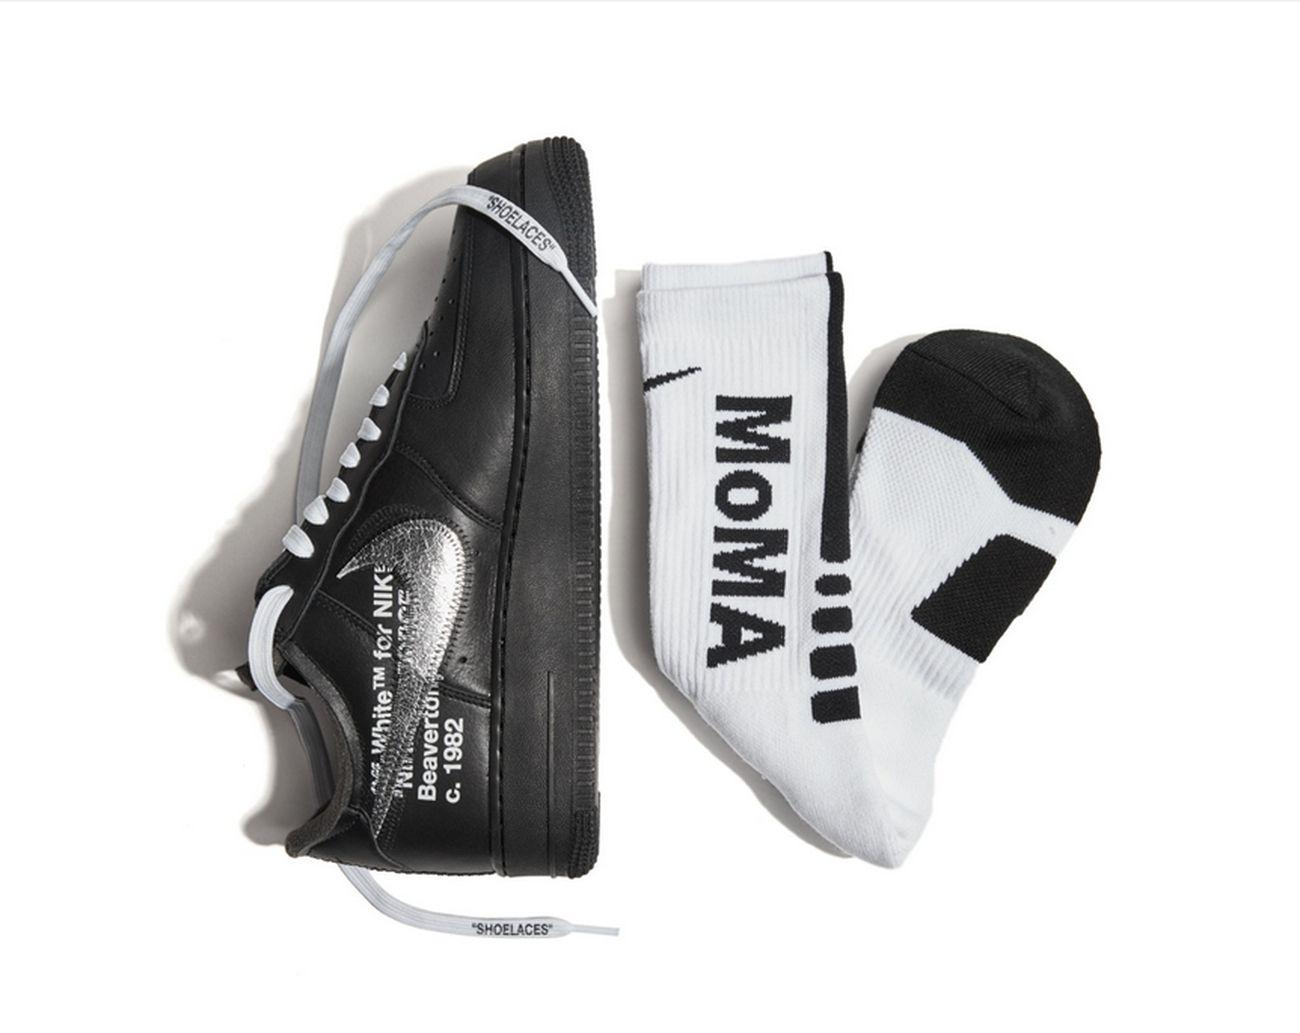 Nike Air Force 1  07 brandizzate MoMA 252f3989b5c